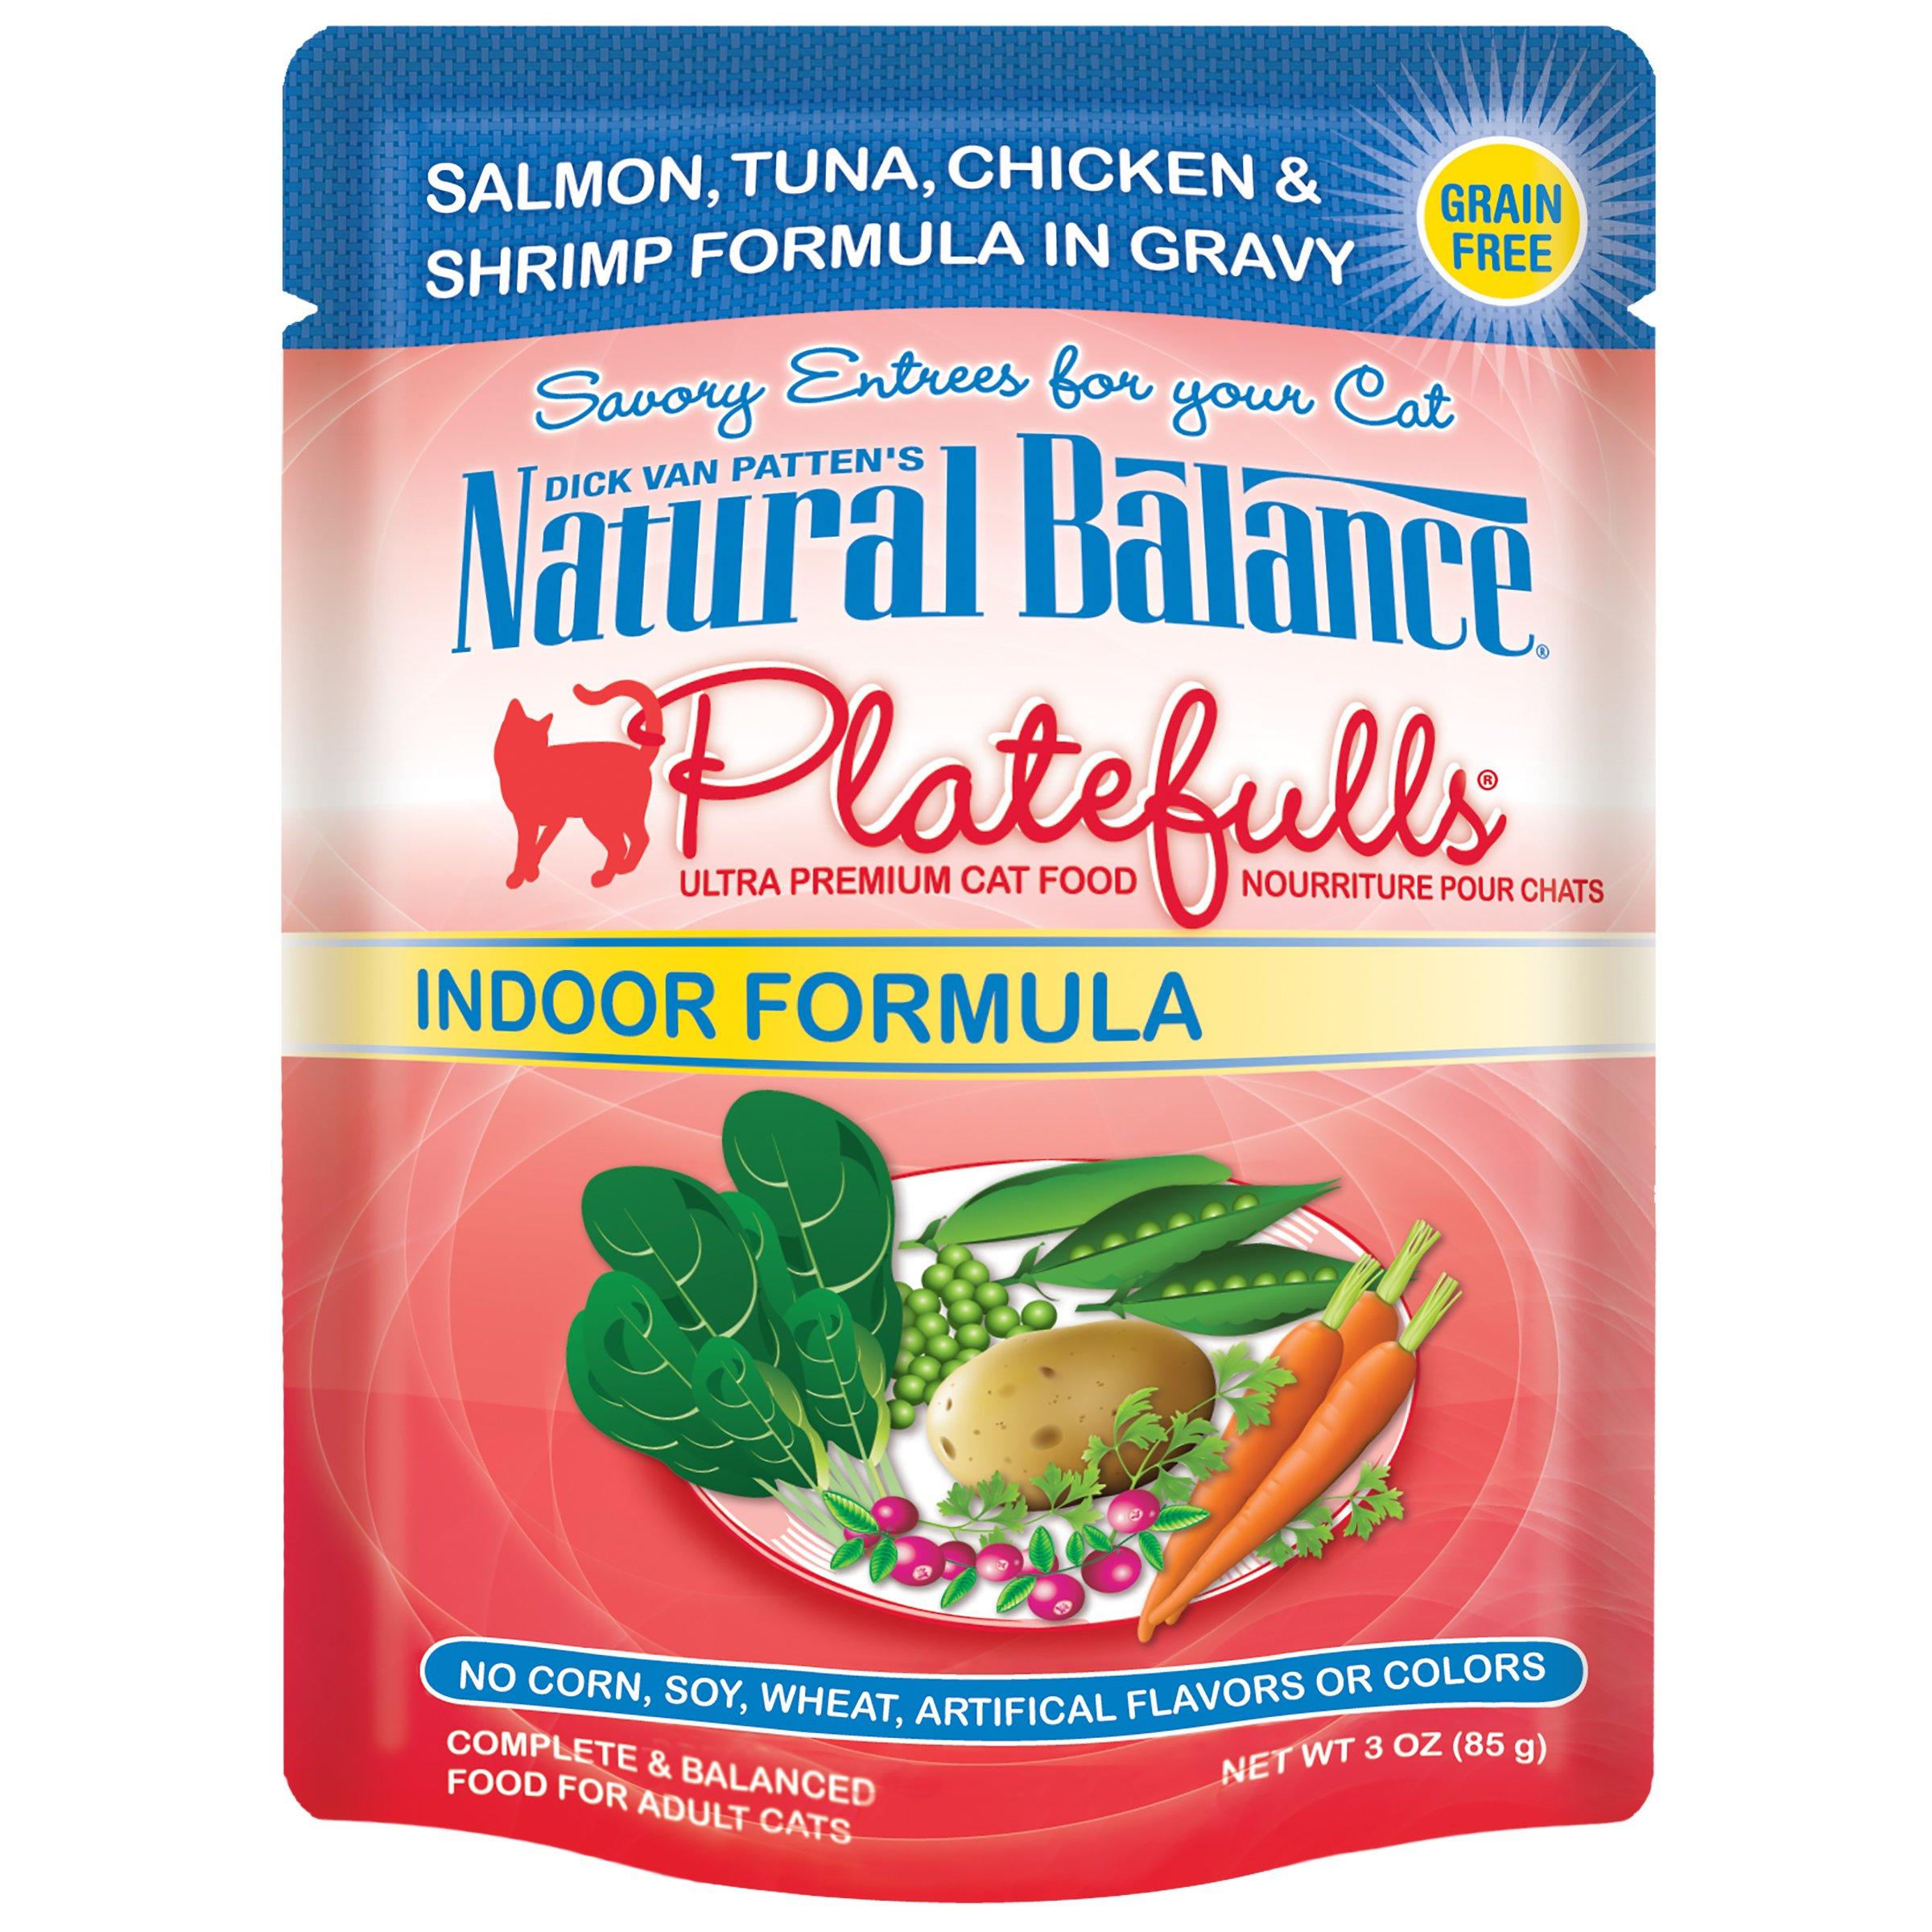 Love cats Natural Balance Platefulls Grain Free Indoor Cat Food